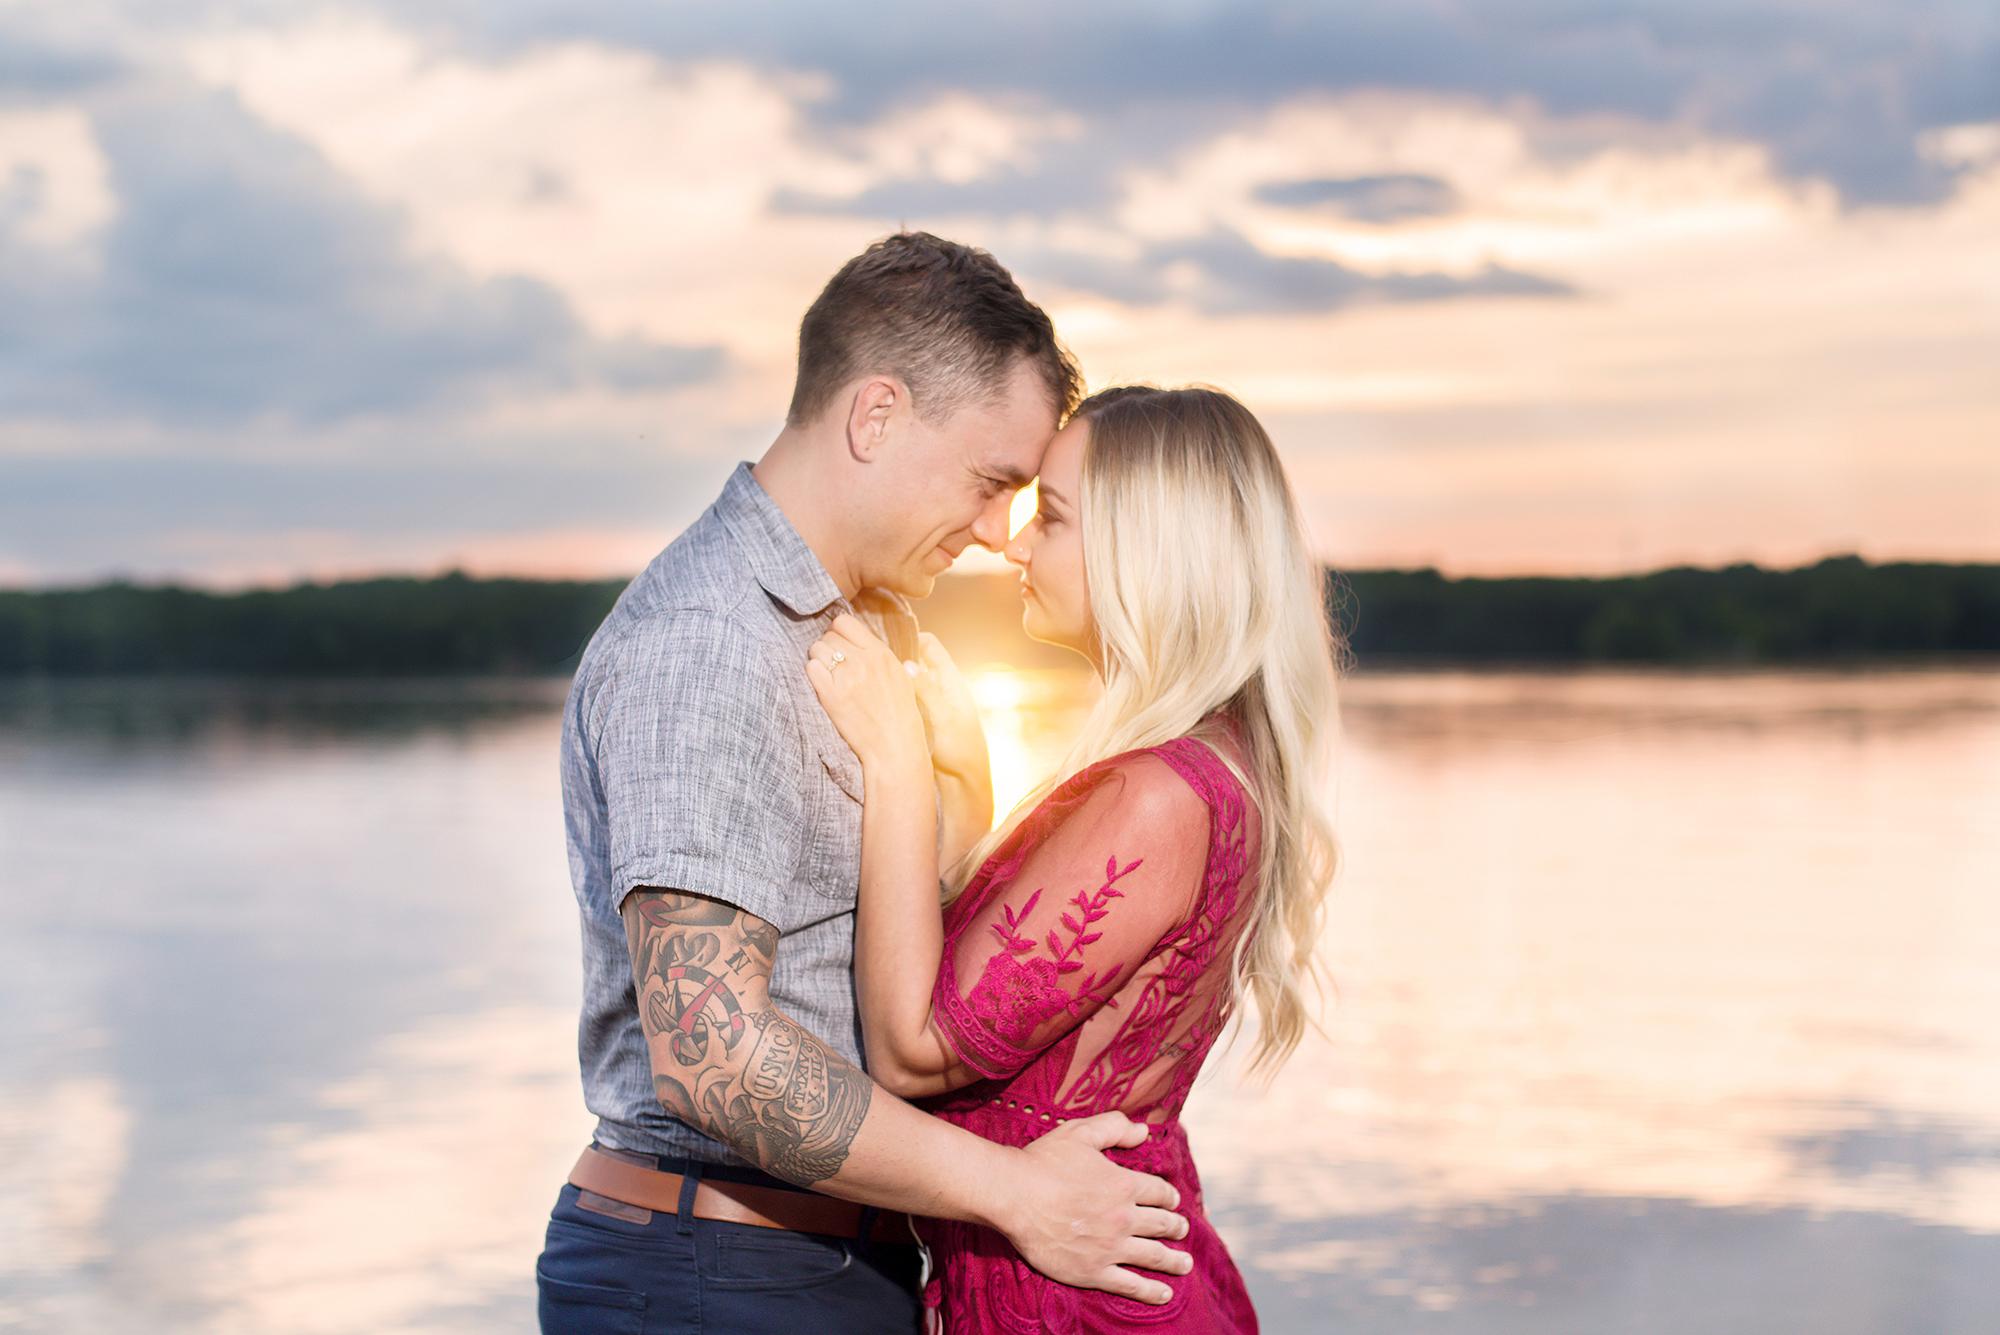 Lindsay-Adkins-Photography-Michigan-Wedding-Photographer-Page-David-Kensington-Metro-Park-Milford-Michigan-Blog-14